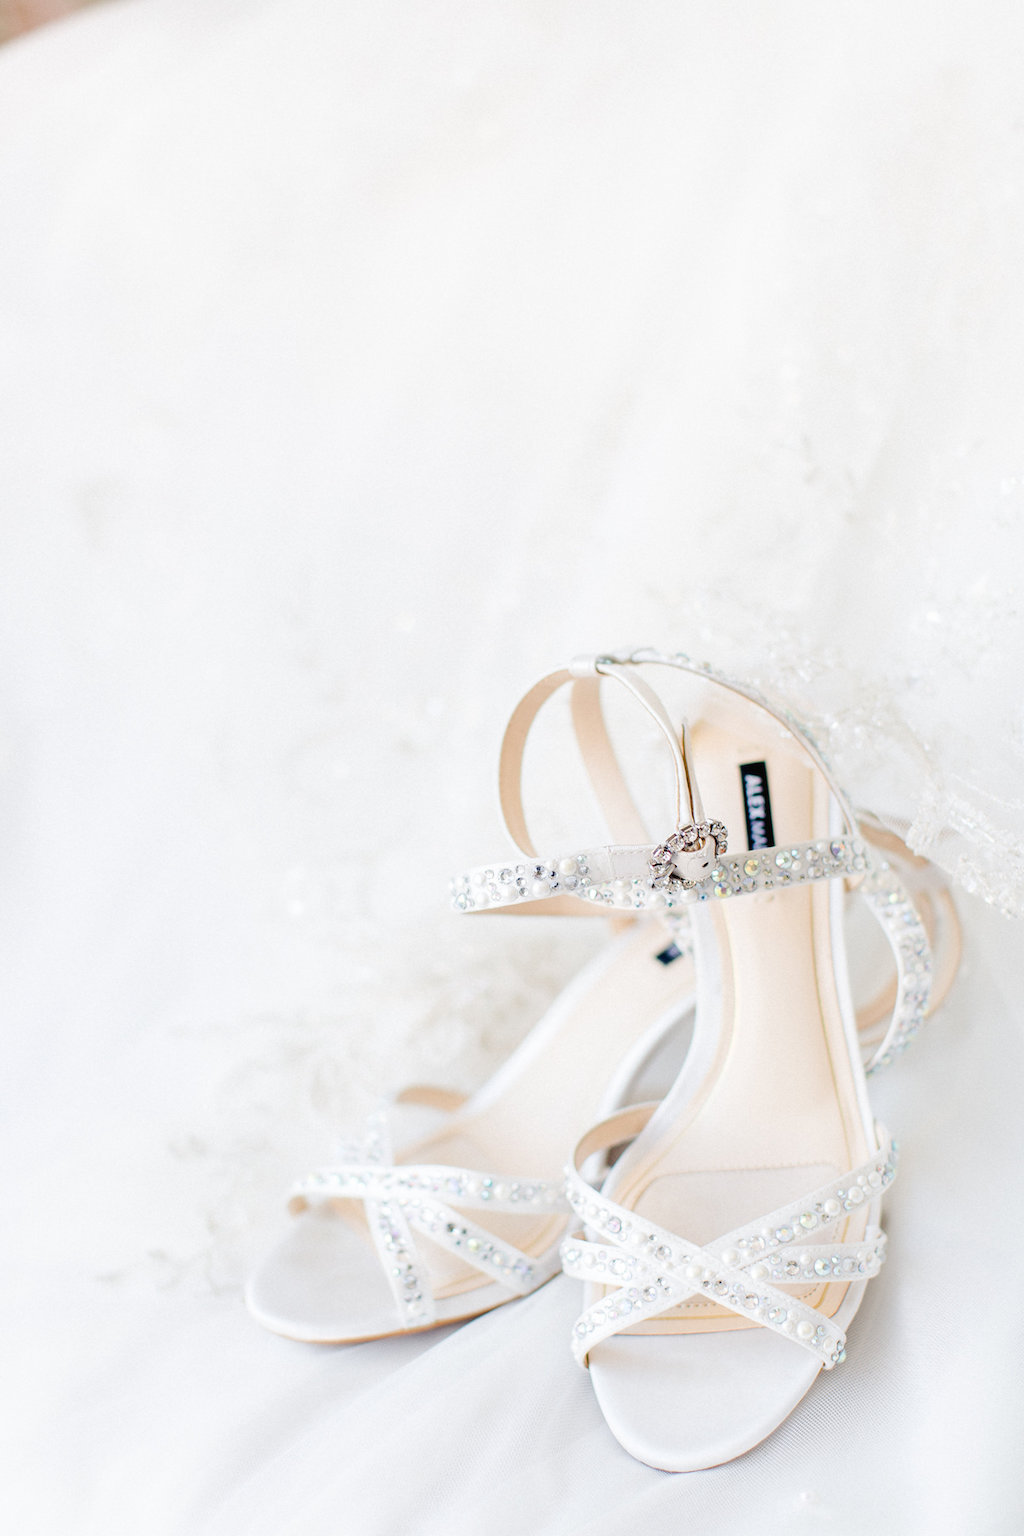 Rhinestone Strappy Peep Toe Wedding Shoes   Tampa Wedding Photographer Ailyn La Torre